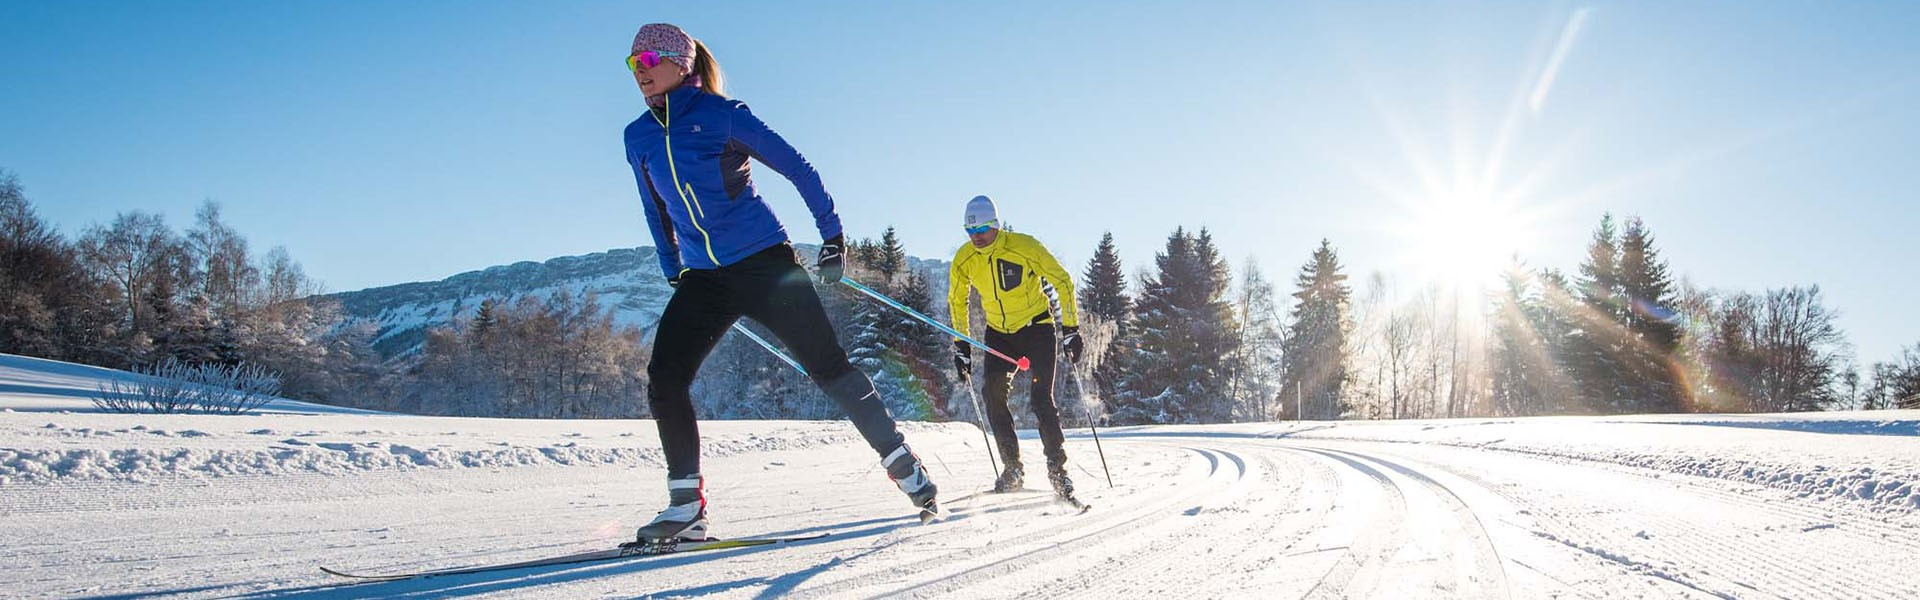 homesgr-ski-de-fond-2018-la-feclaz-bd-savoie-grand-revard-peignee-verticale-t-nalet-77-409